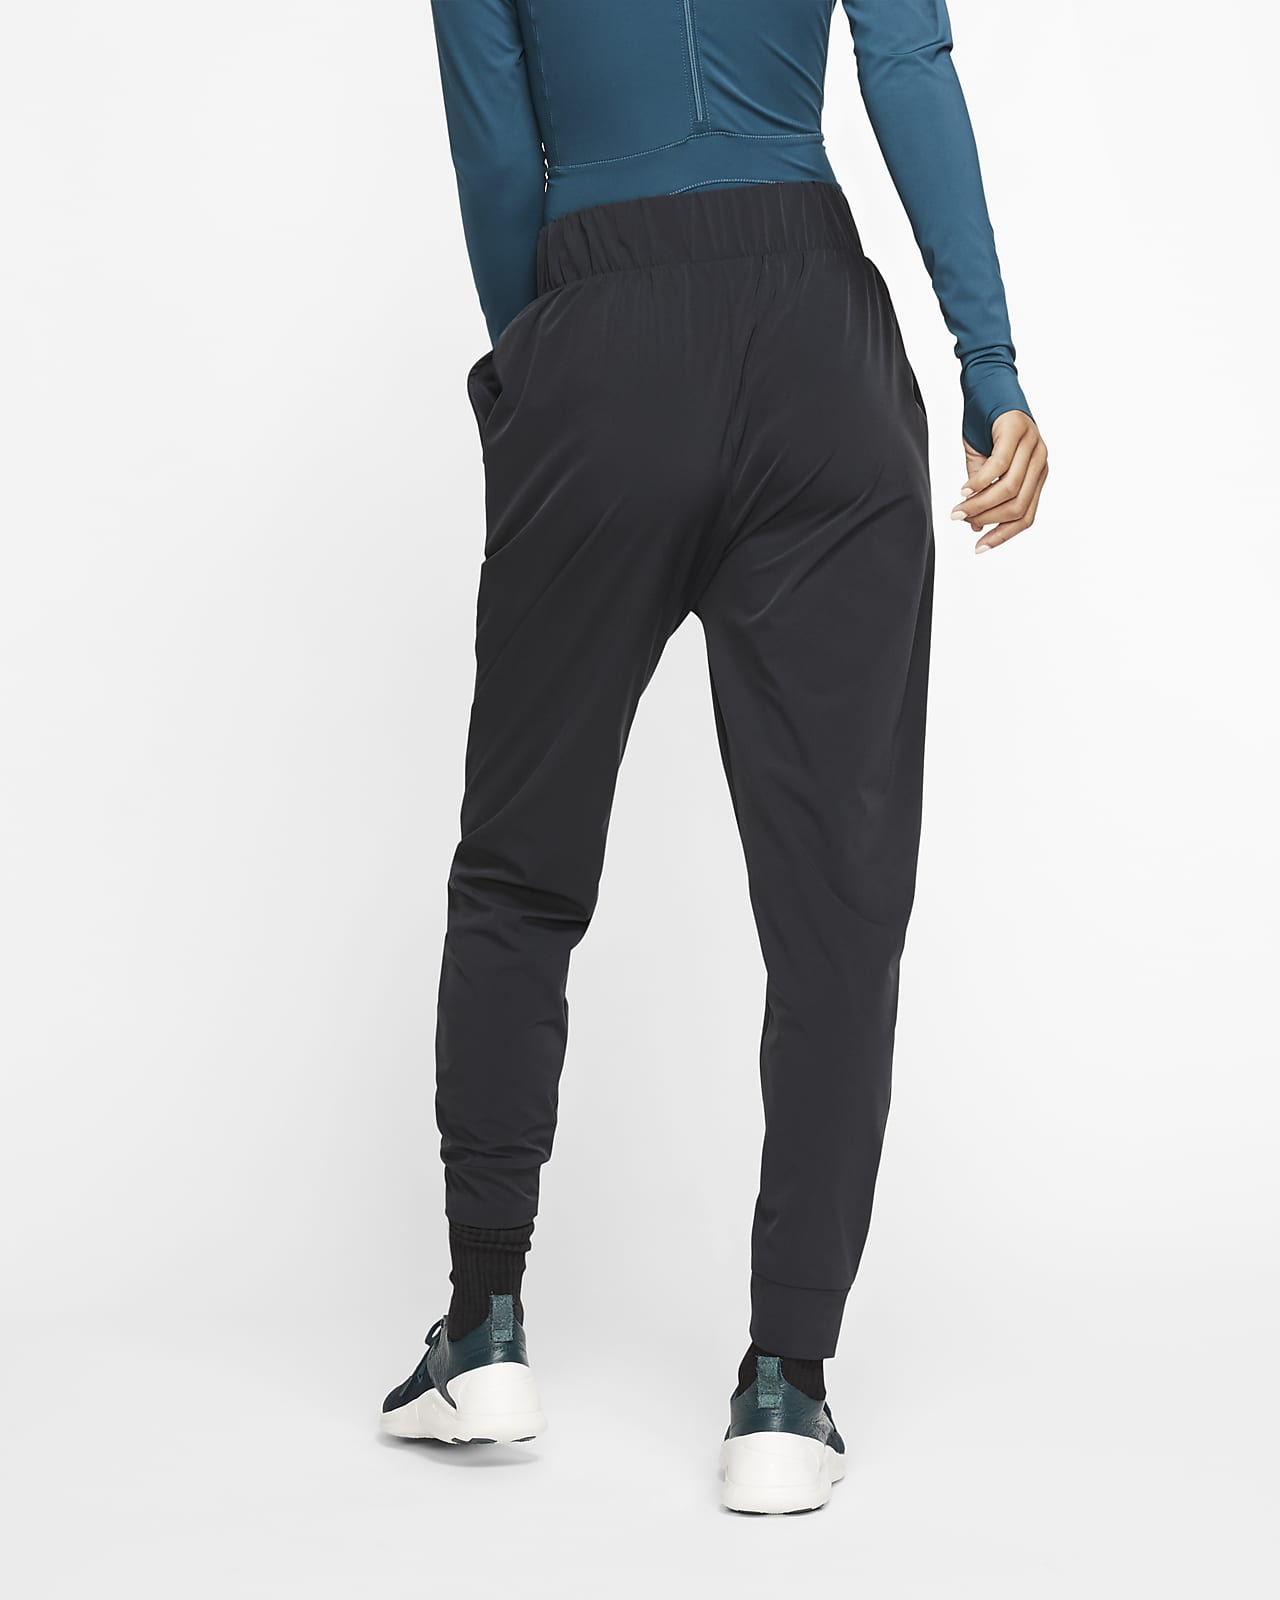 Pantalon de training Nike Bliss pour Femme